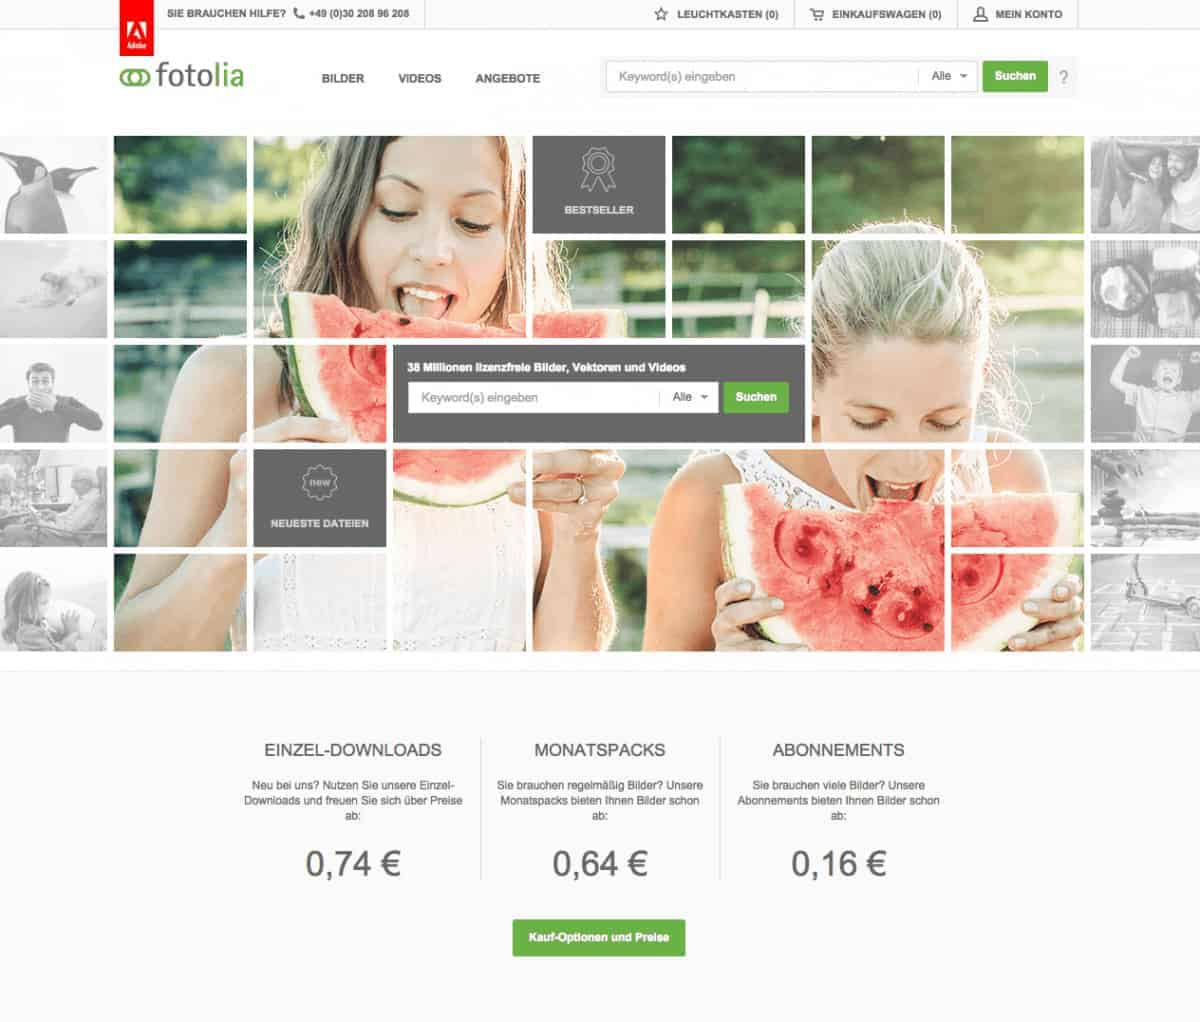 Fotolia mit frischem Design - Fotolia Home